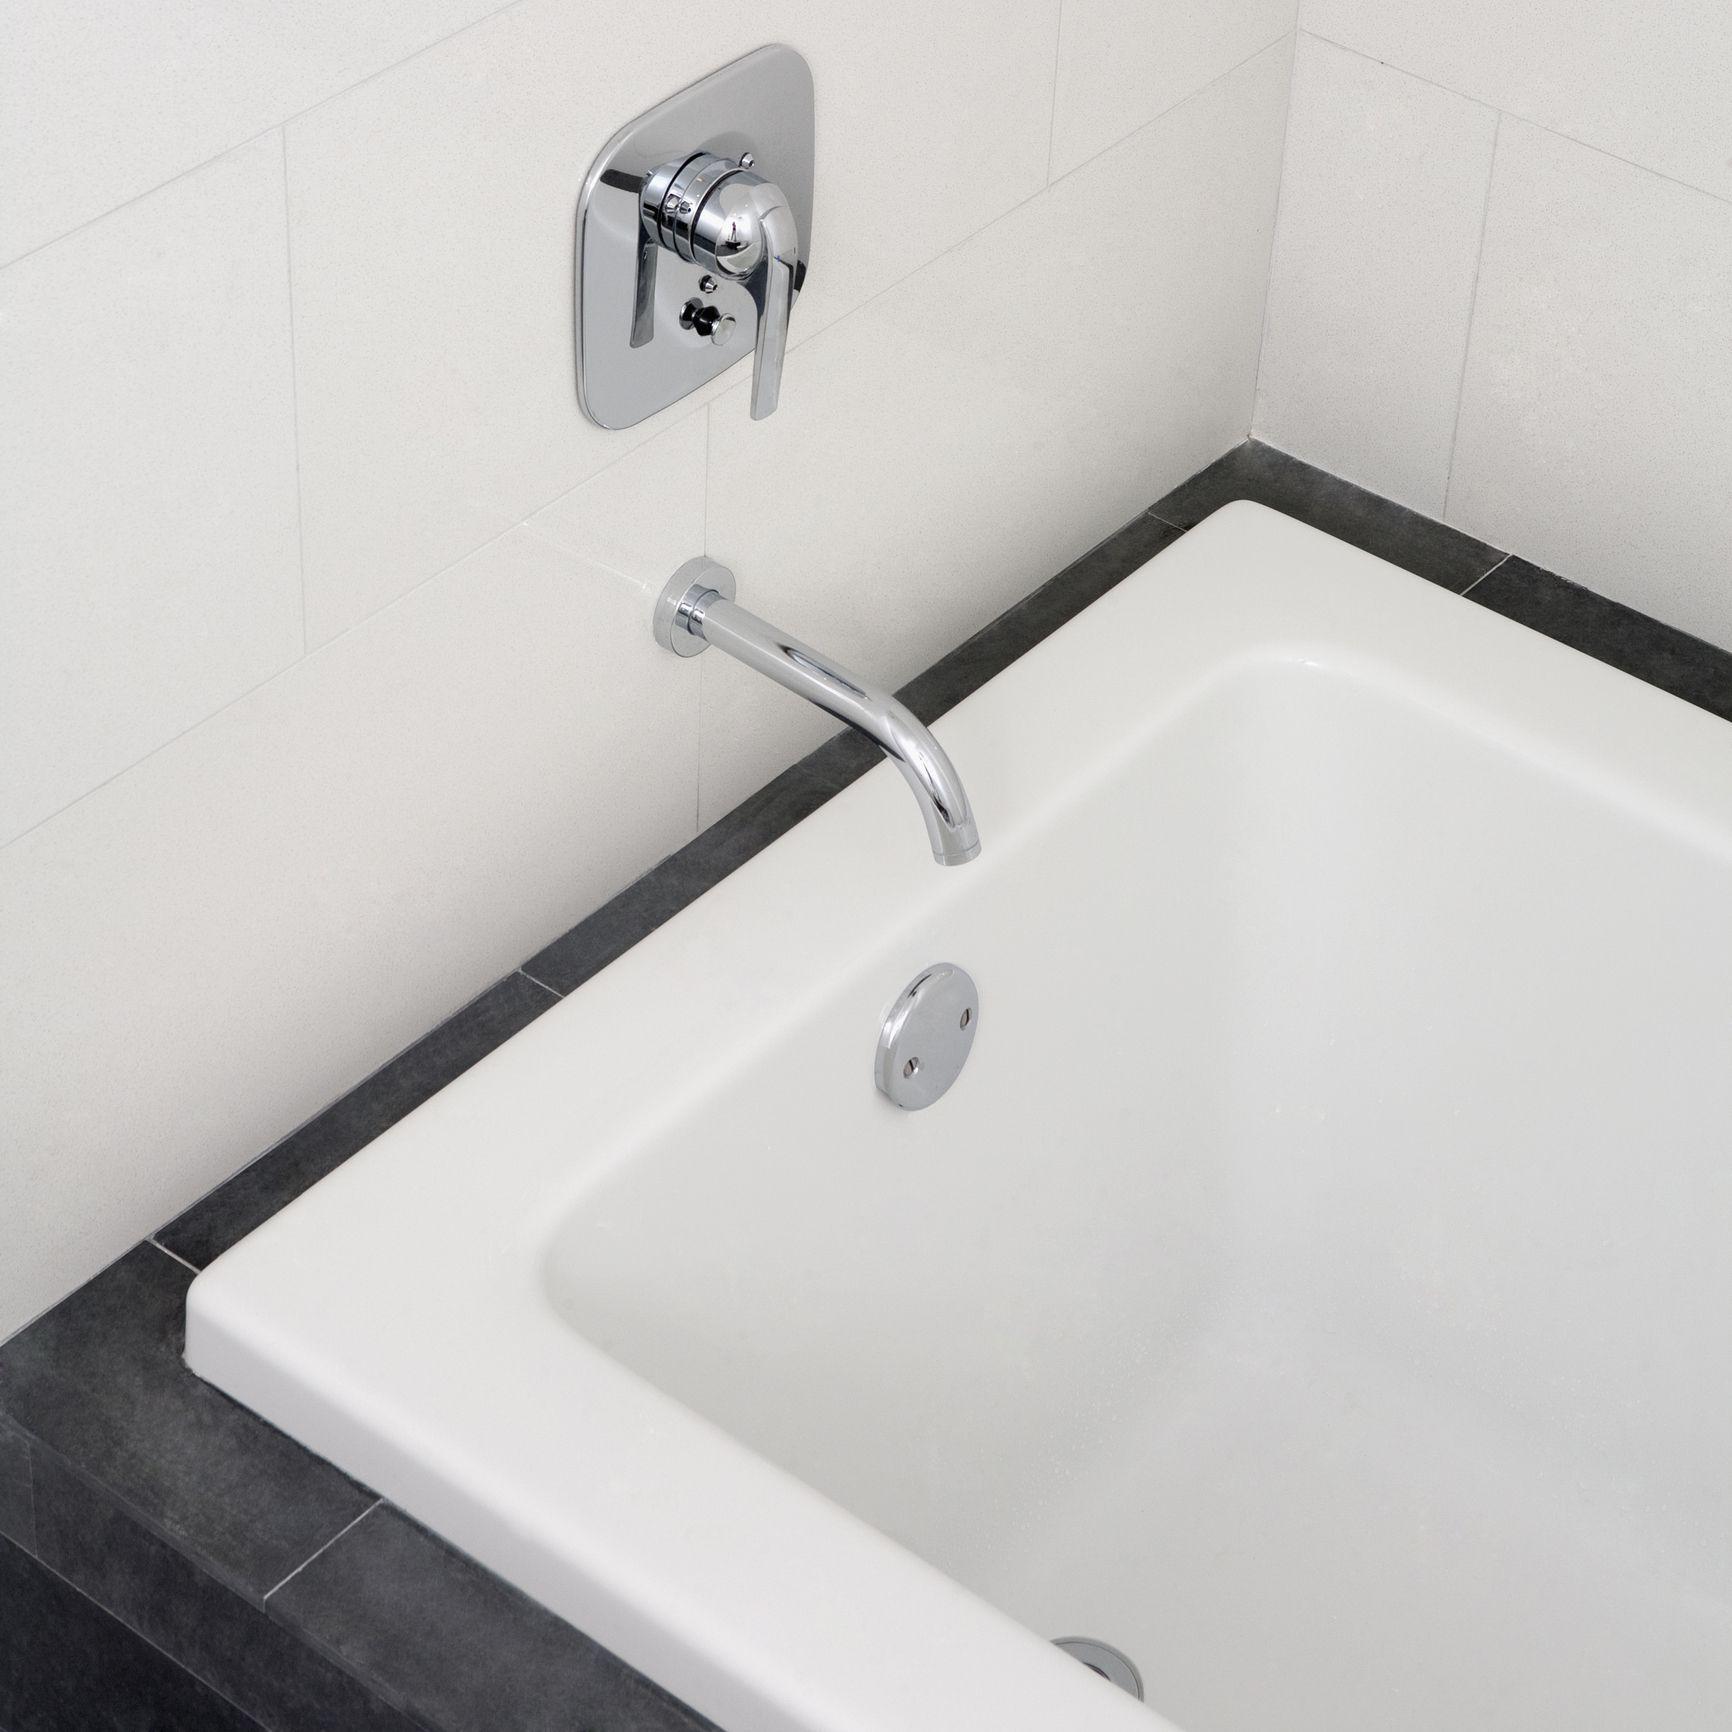 Awesome soaker Tub Faucet Photograph Of Bathtub Ideas